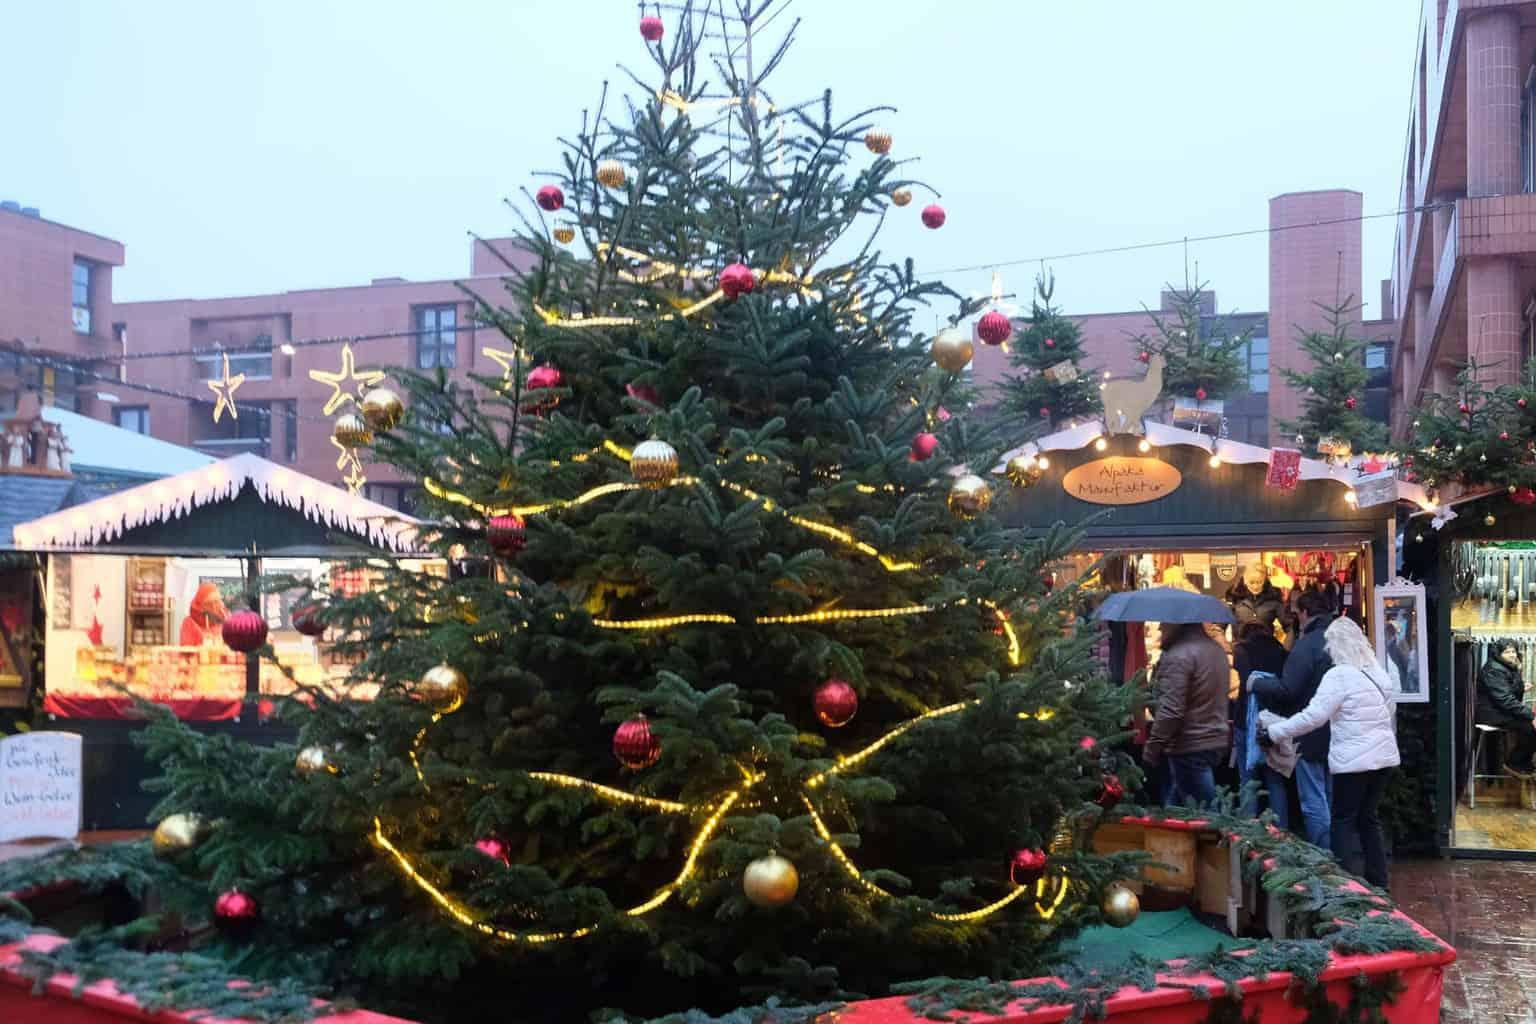 Kerstmarkt munster Aegidii kerstmarkt